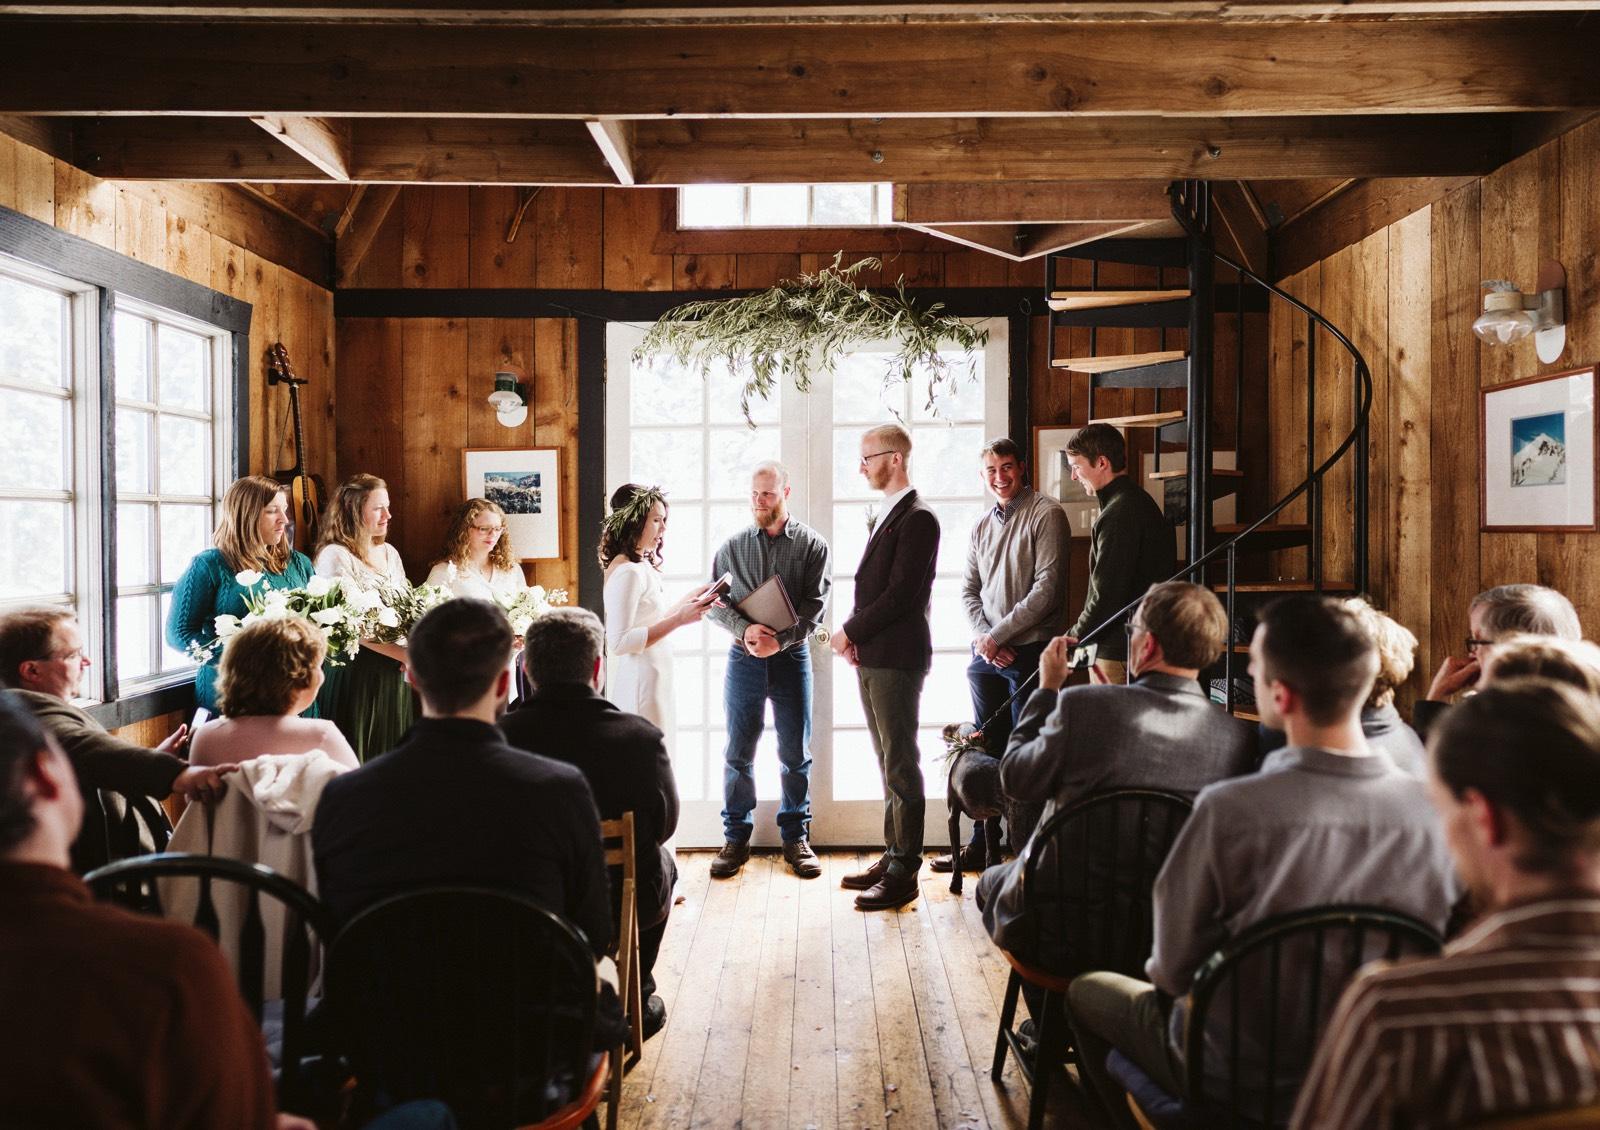 alpine-lakes-high-camp-winter-wedding-39 ALPINE LAKES HIGH CAMP WEDDING